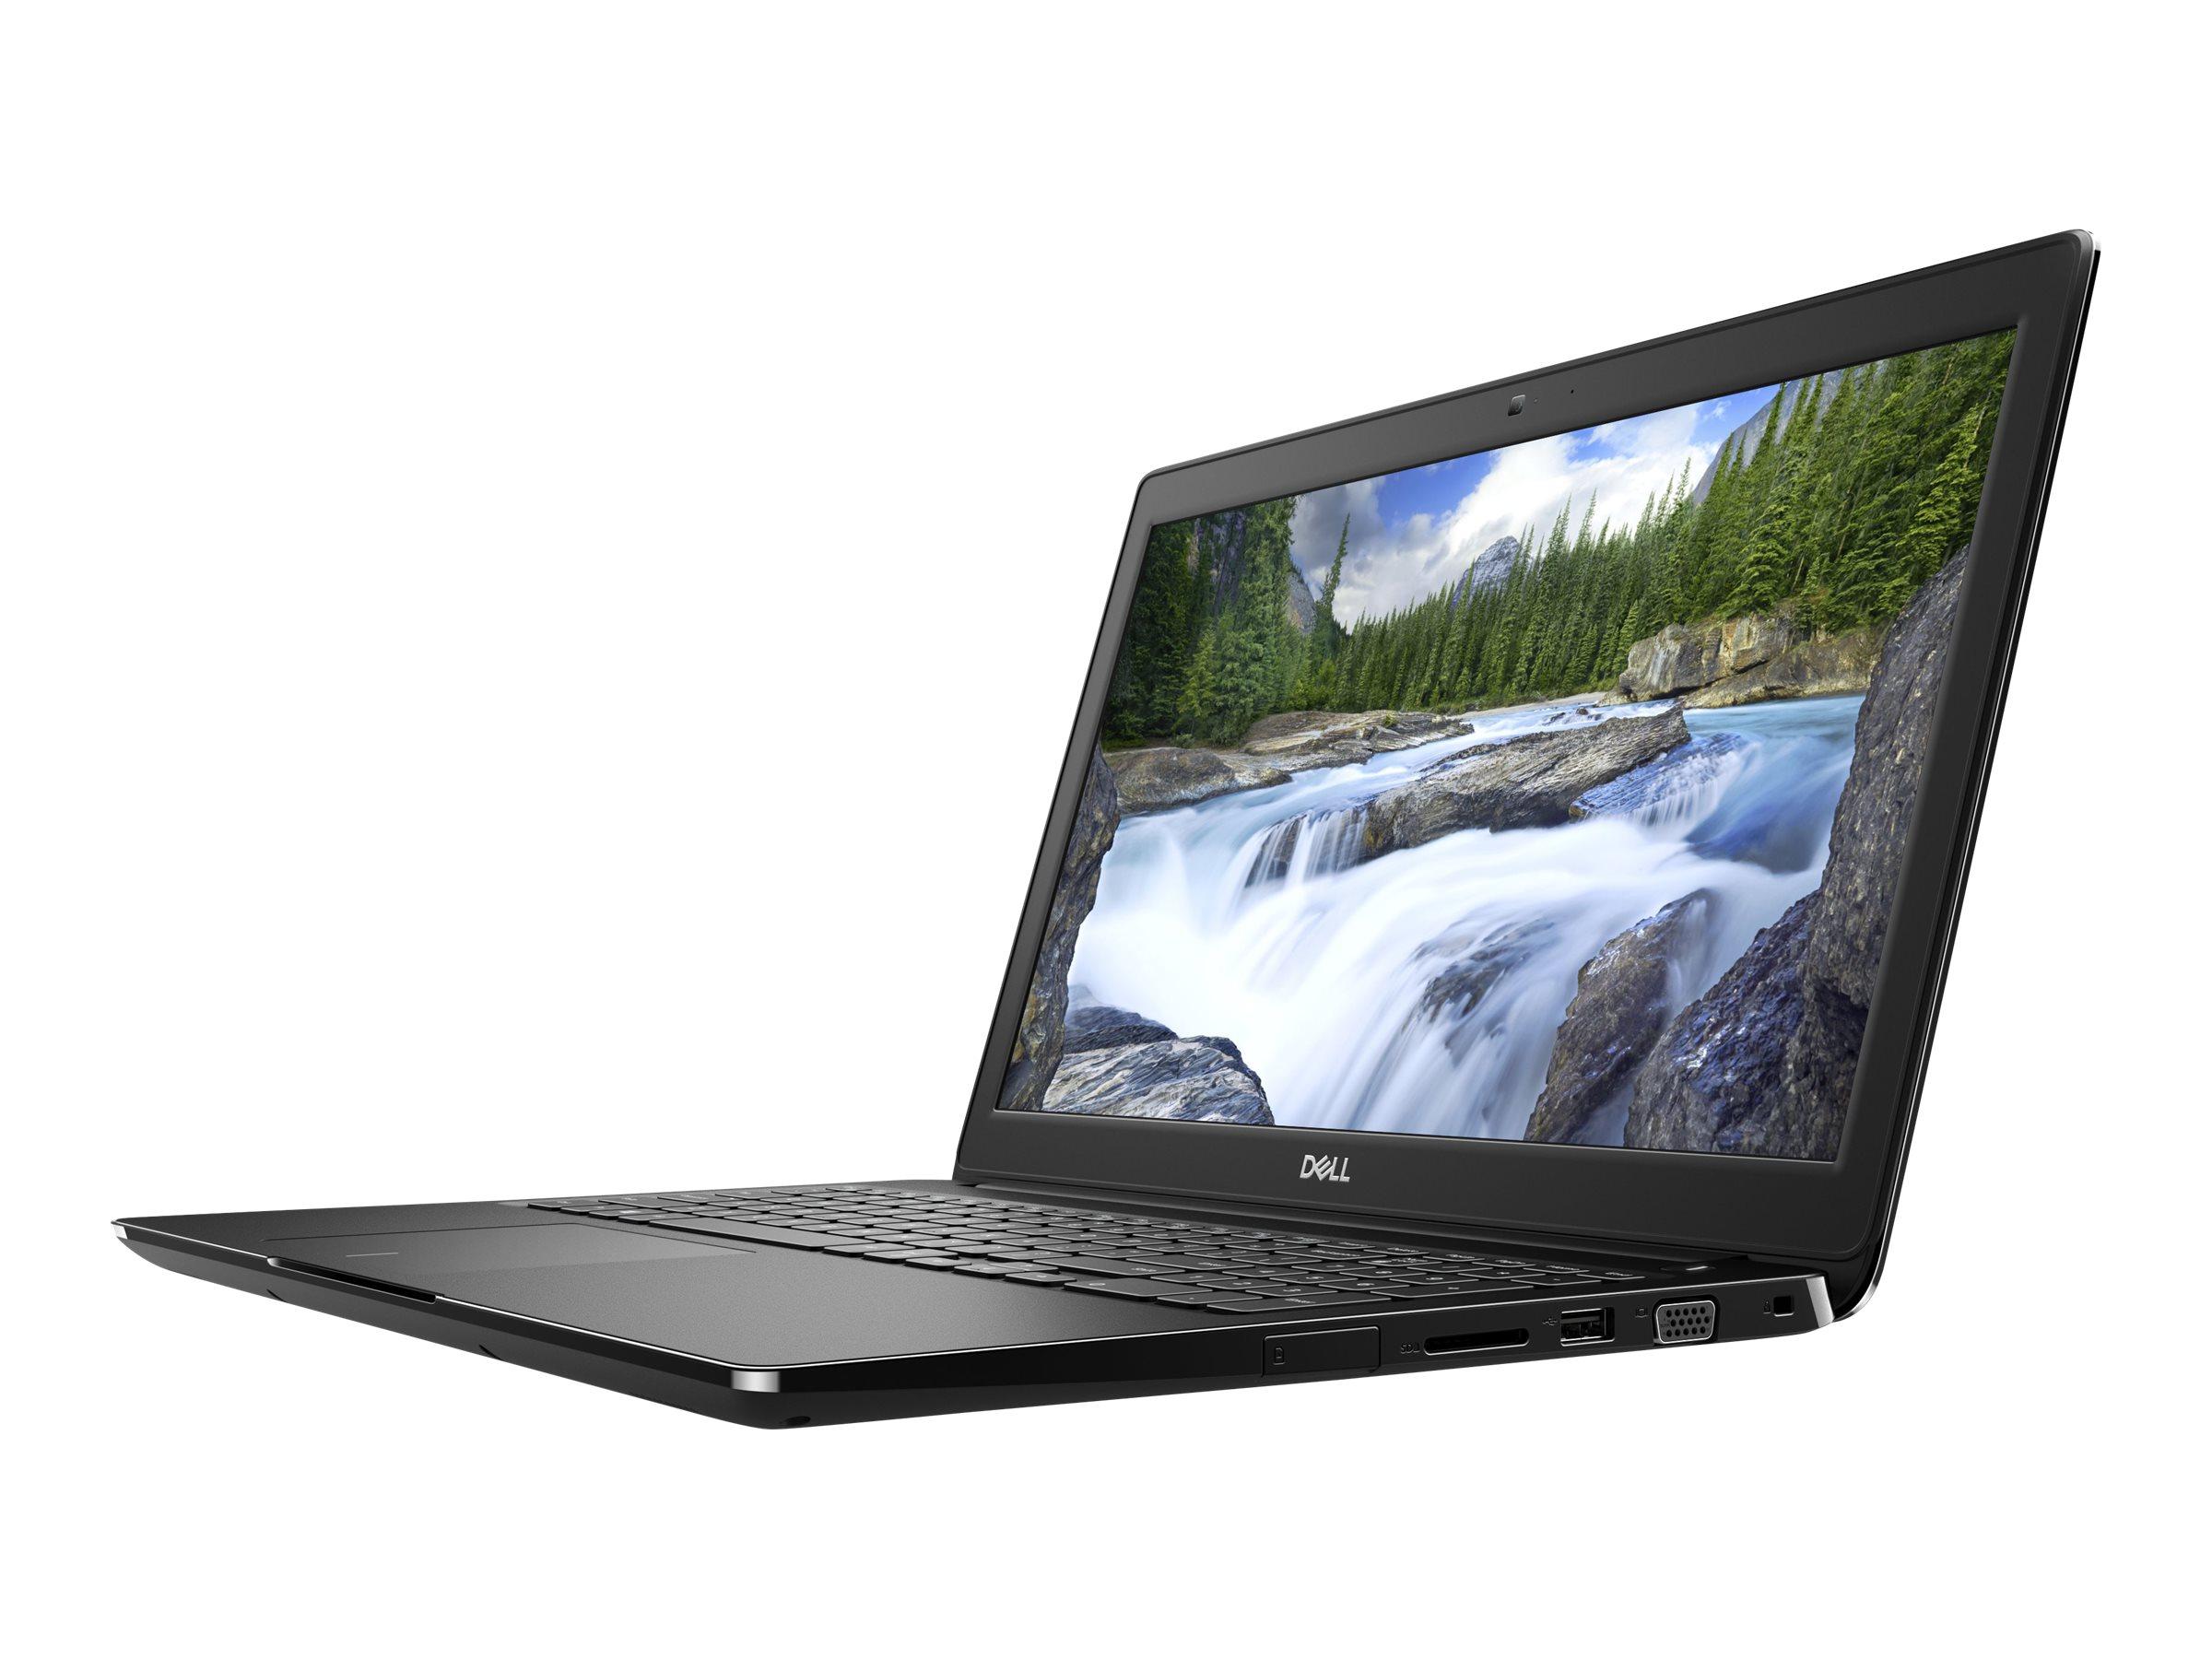 "Dell Latitude 3500 - Core i5 8265U / 1.6 GHz - Win 10 Pro 64-Bit - 8 GB RAM - 256 GB SSD NVMe, Class 35 - 39.6 cm (15.6"""